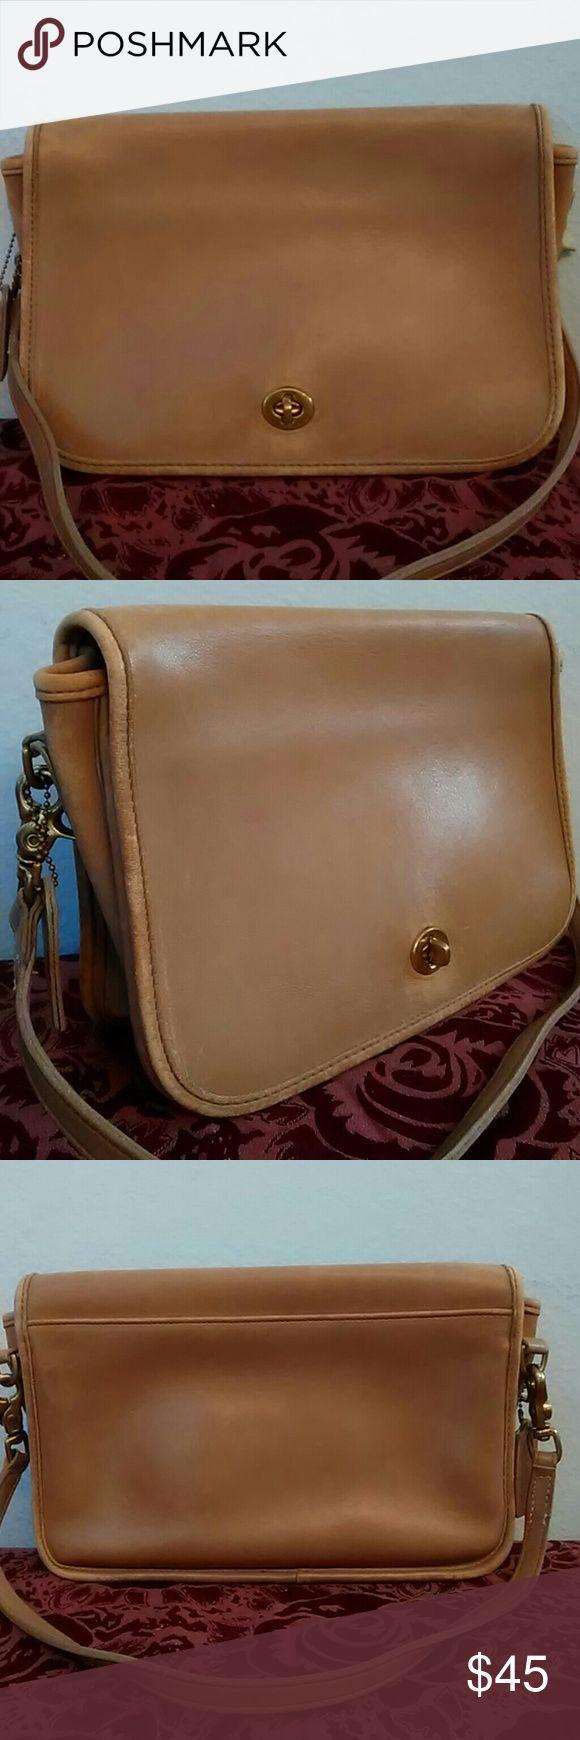 Vintage Coach Satchel Authentic vintage Coach leather handbag, hard to find Coach, brass hardware. Coach Bags Shoulder Bags